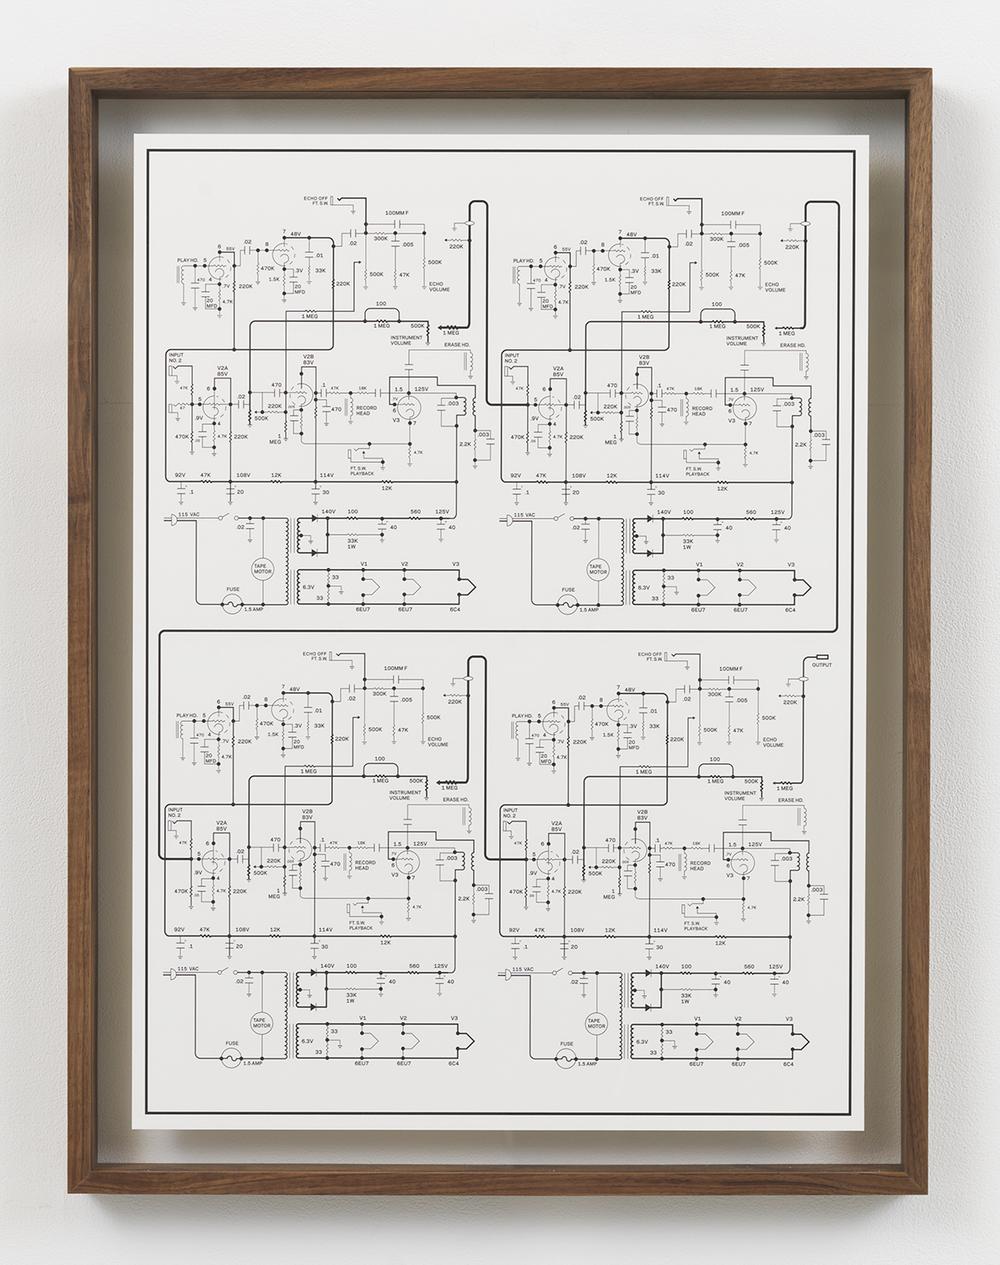 Echoplex Ep 1 Cascade, 2015 Inkjet print in artist frame 33.75 x 25.75 inches